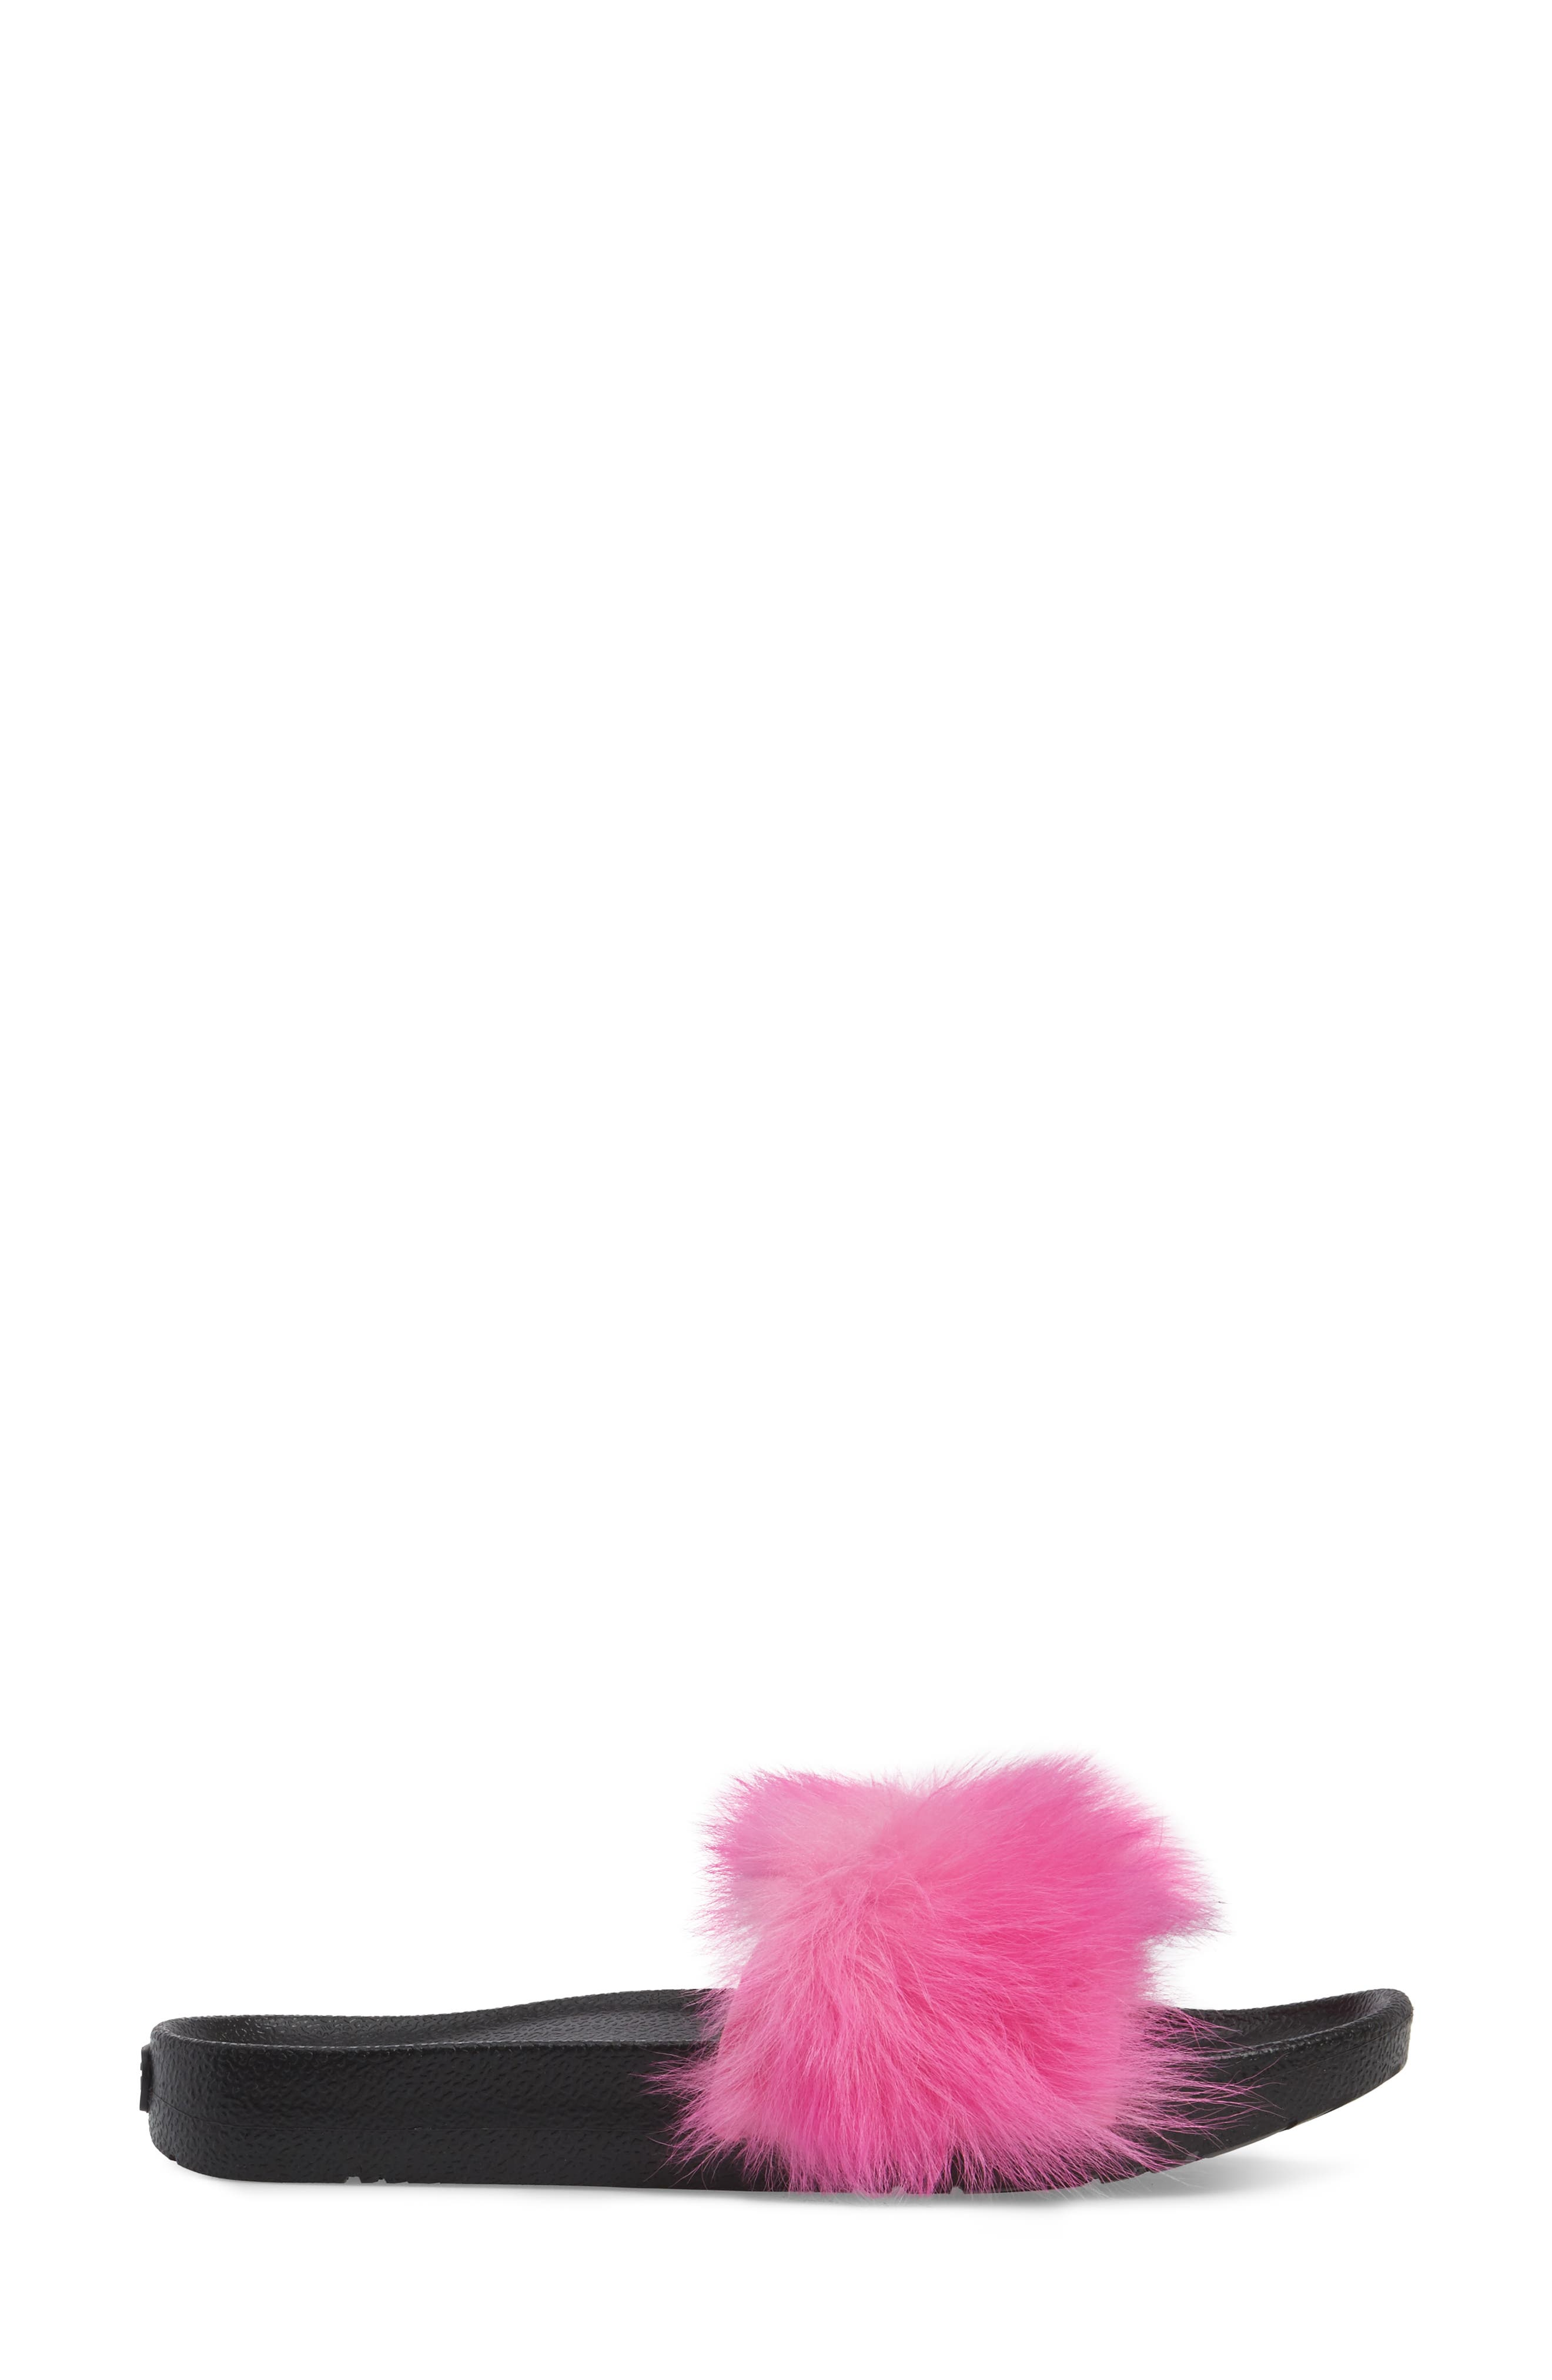 Royale Genuine Shearling Slide Sandal,                             Alternate thumbnail 3, color,                             Neon Pink